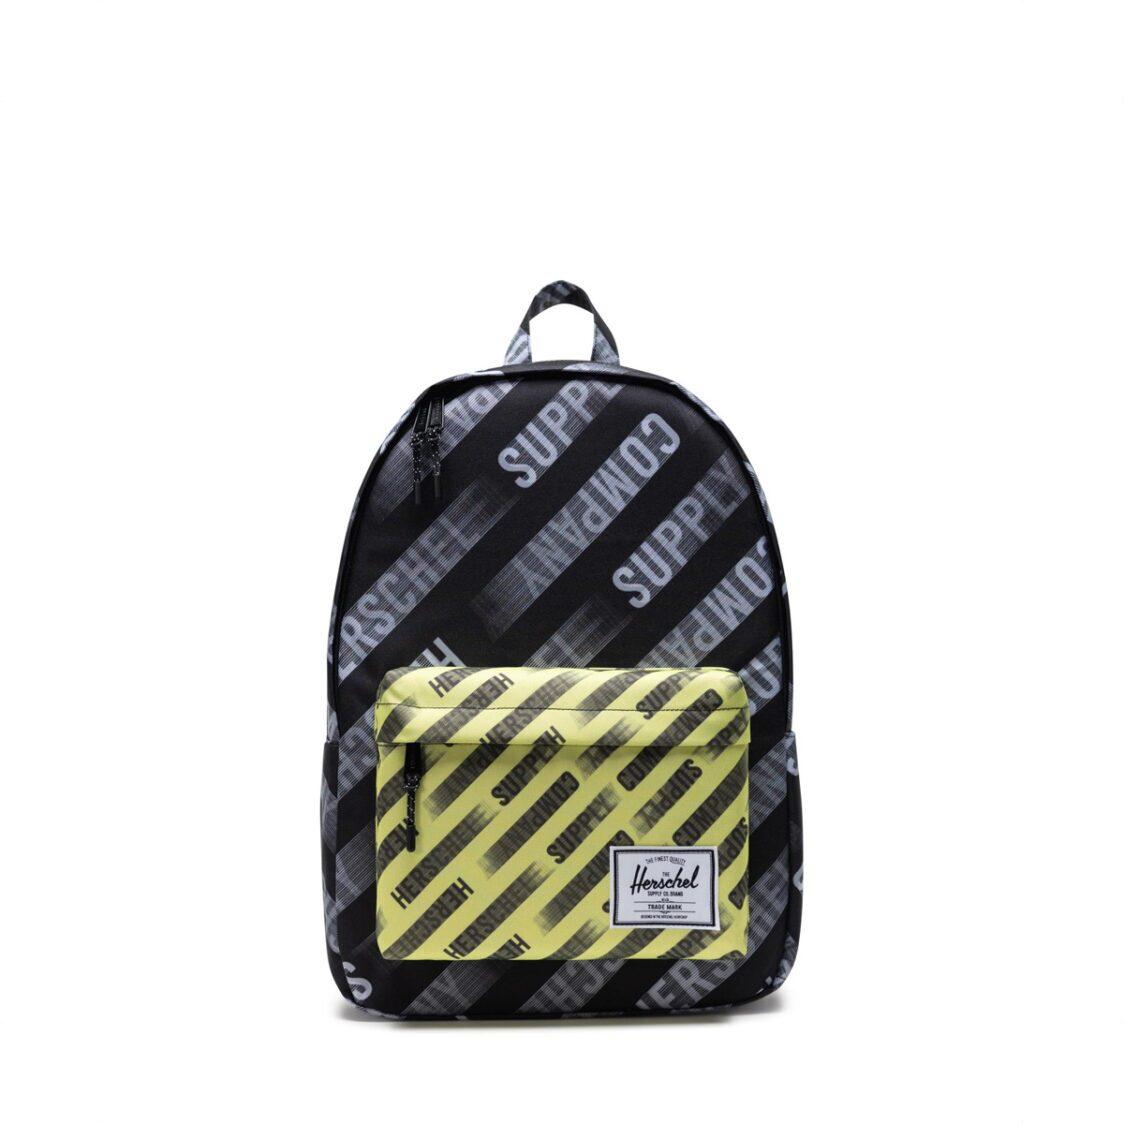 Herschel Classic X-Large - Motion BlackHighlight Backpack 10492-04485-OS